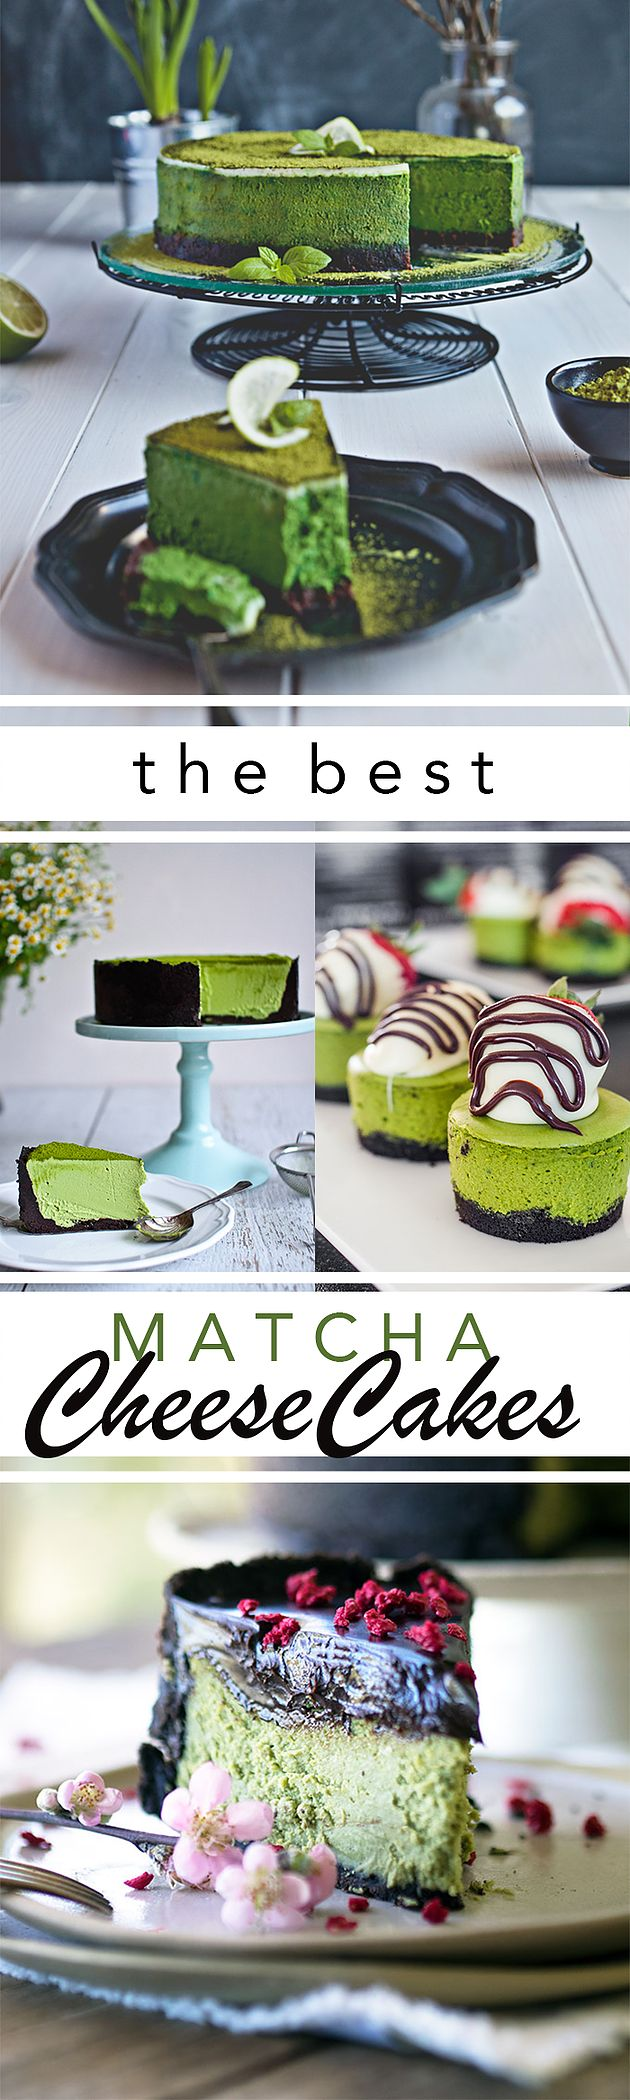 The Best Antioxidant-Rich Matcha Cheesecakes You Need To Try!!! – MariMatcha Tea Company | Pure Organic Ceremonial Grade Matcha